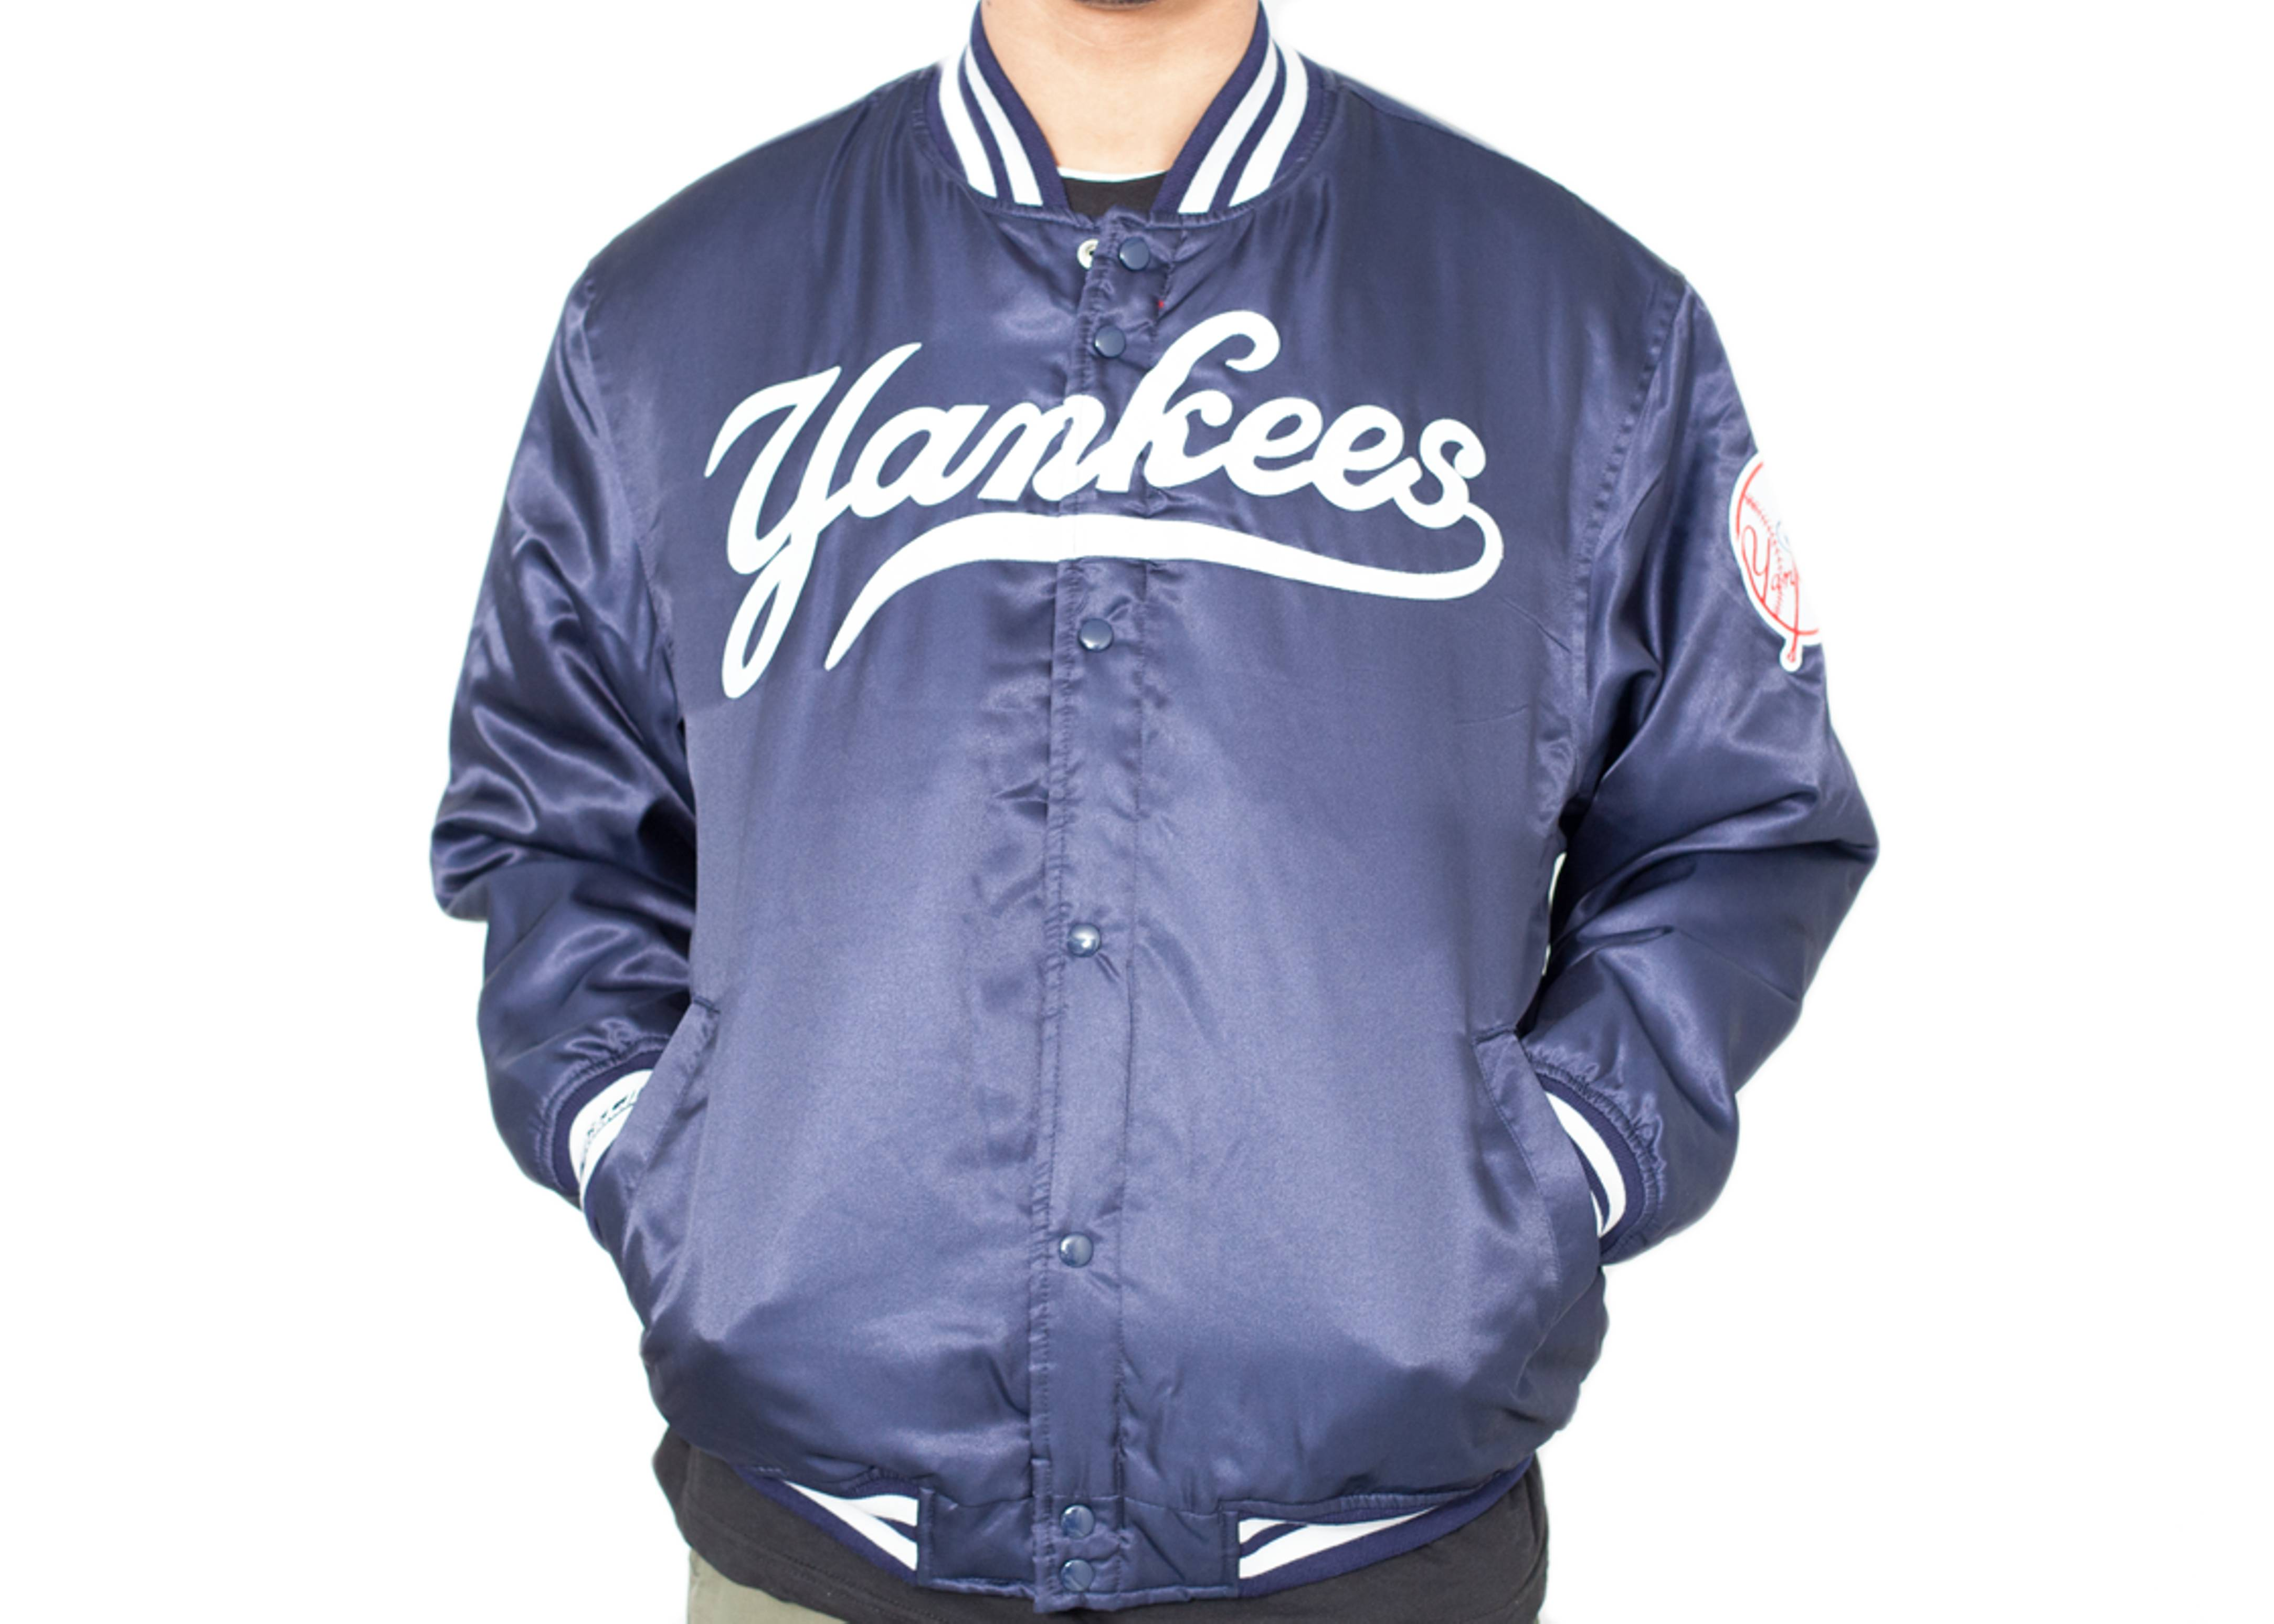 finest selection 99b17 a0afa New York Yankees Mlb Satin Jacket - Mitchell & Ness - 43 ...